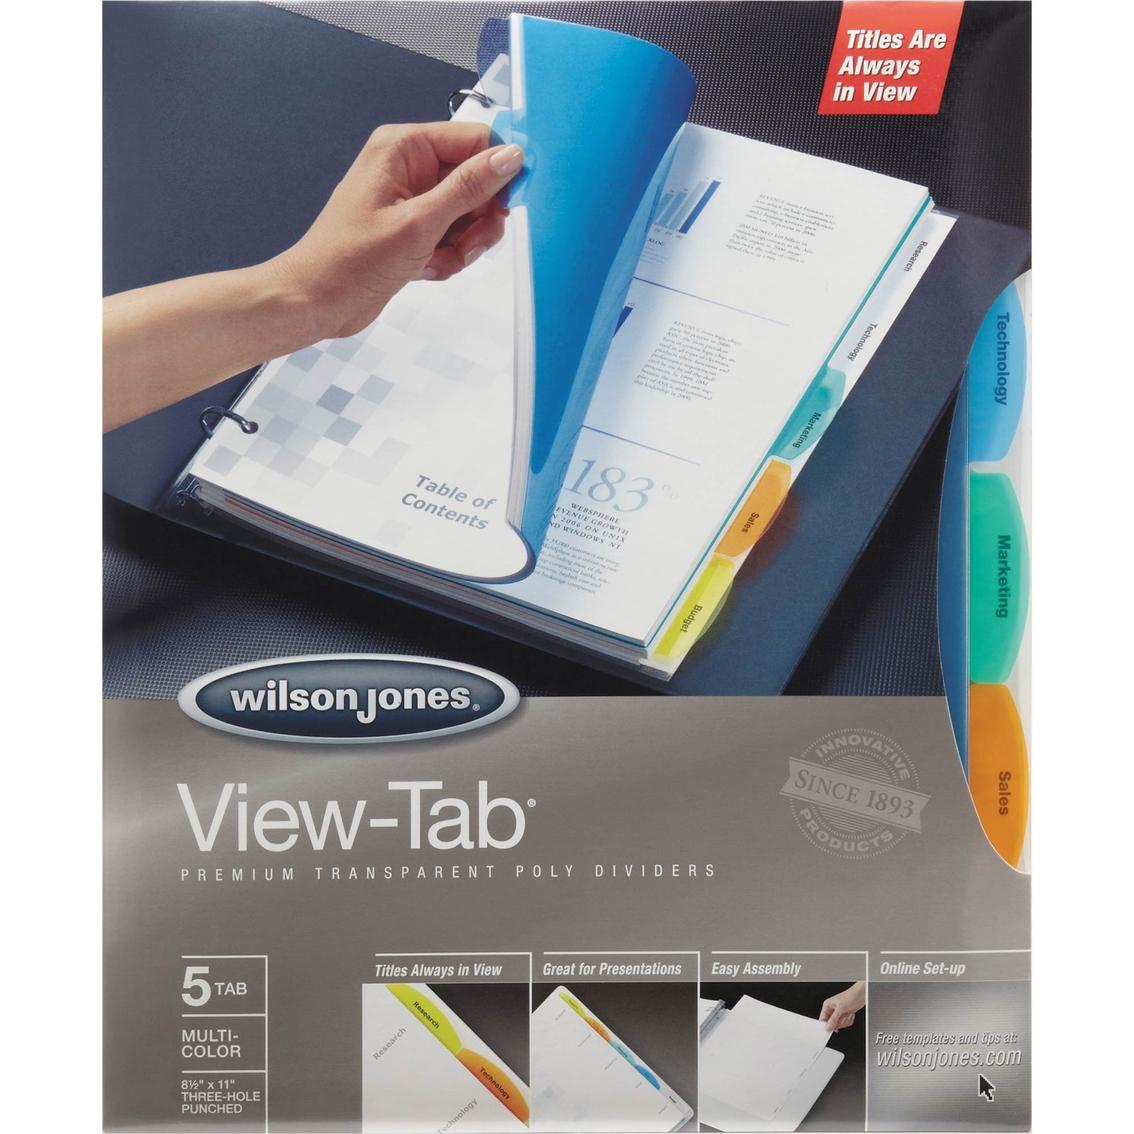 Wilson jones view tab transparent index dividers 5 tab for Templates wilson jones 8 tabs